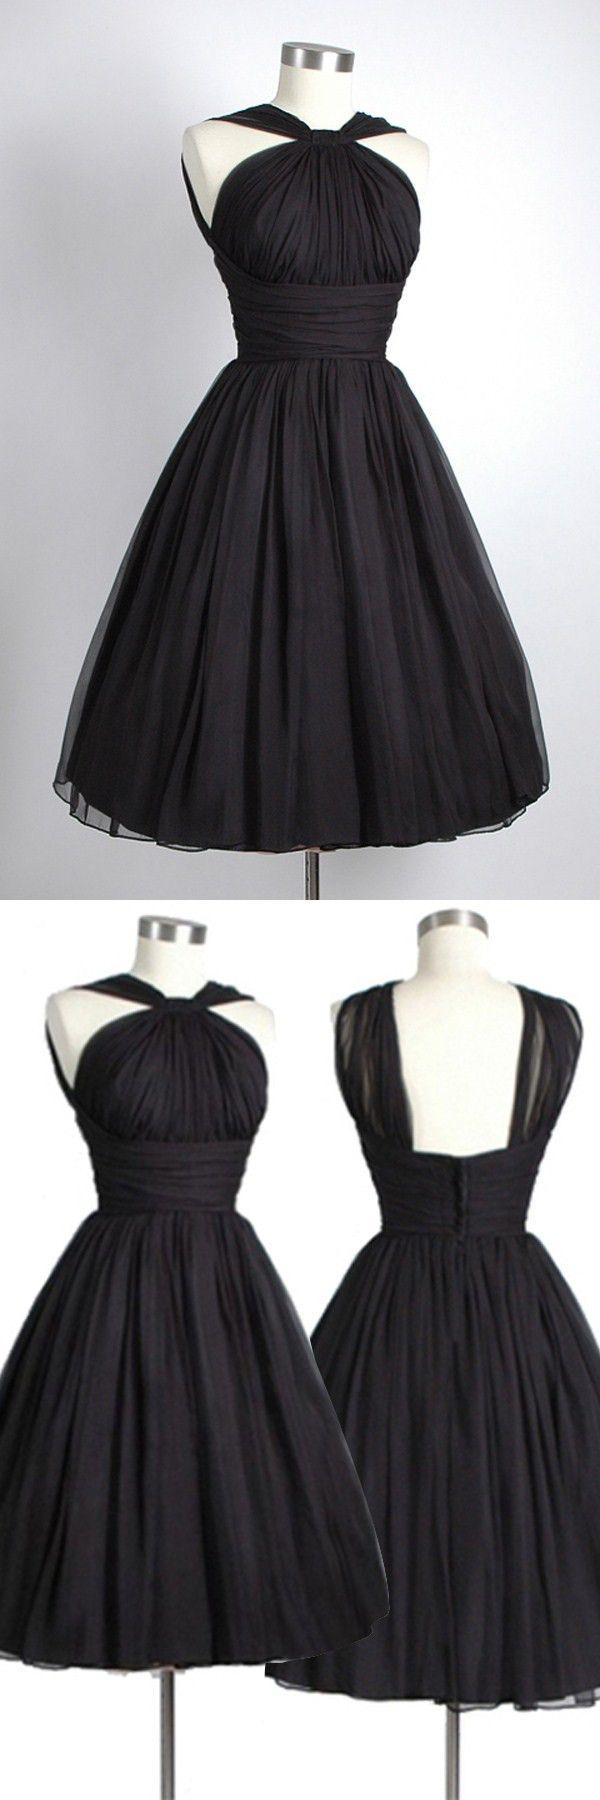 Prime 25 Best Ideas About Vintage Prom Dresses On Pinterest Pretty Hairstyles For Women Draintrainus